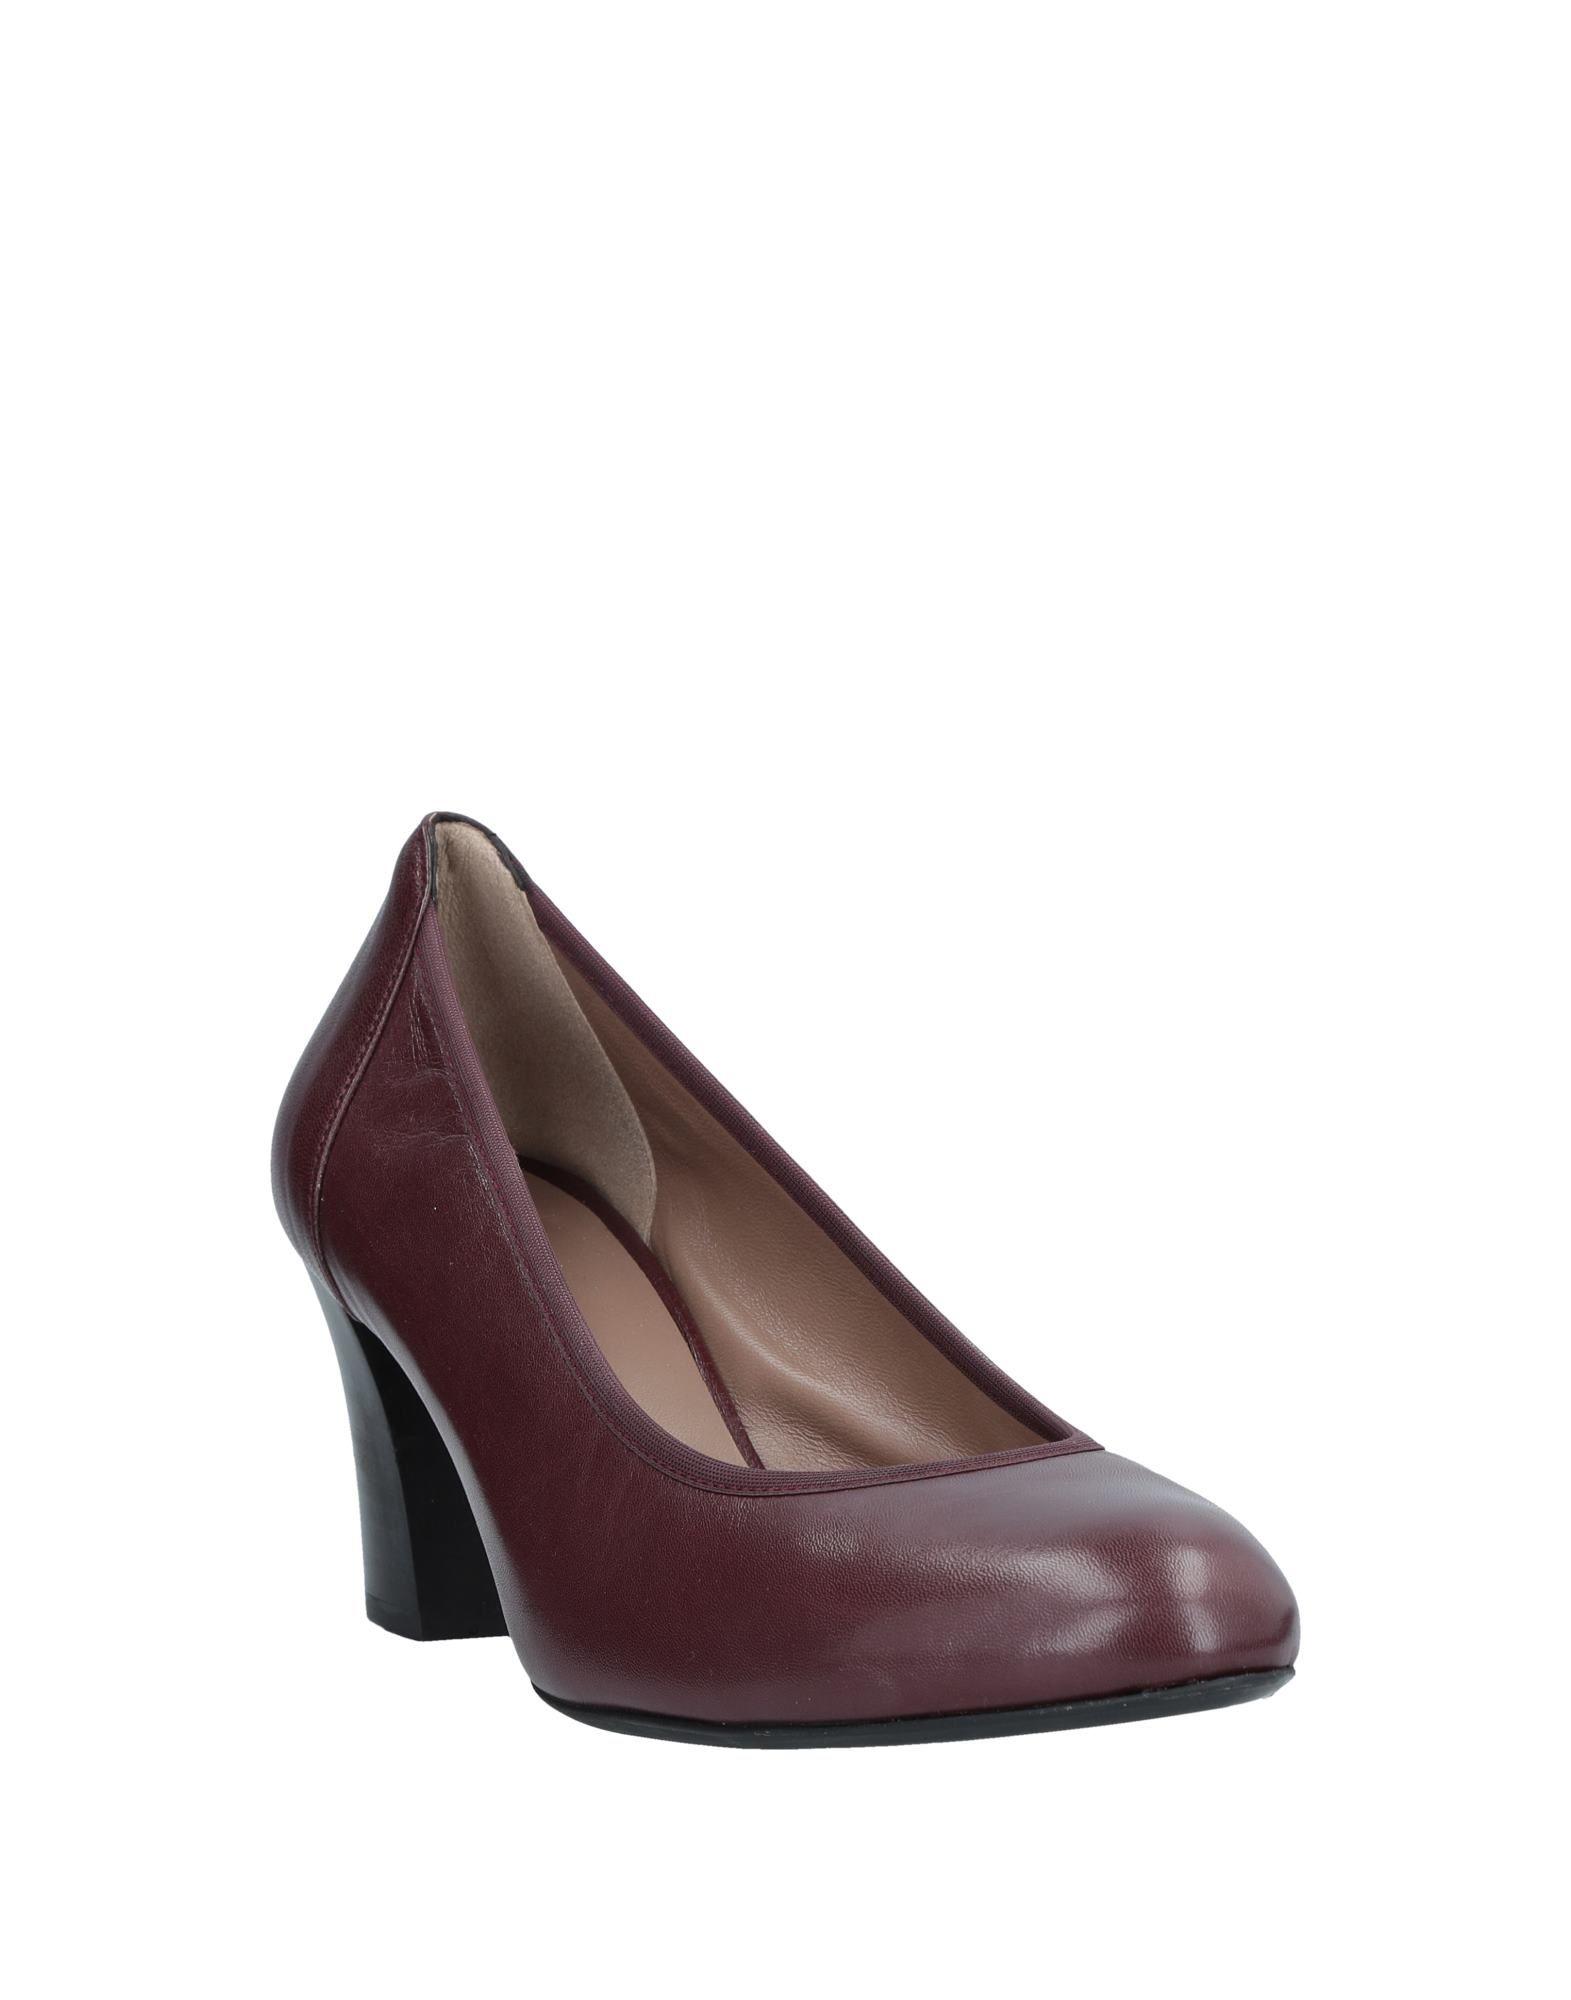 Melluso Gute Pumps Damen  11537668FH Gute Melluso Qualität beliebte Schuhe 473379